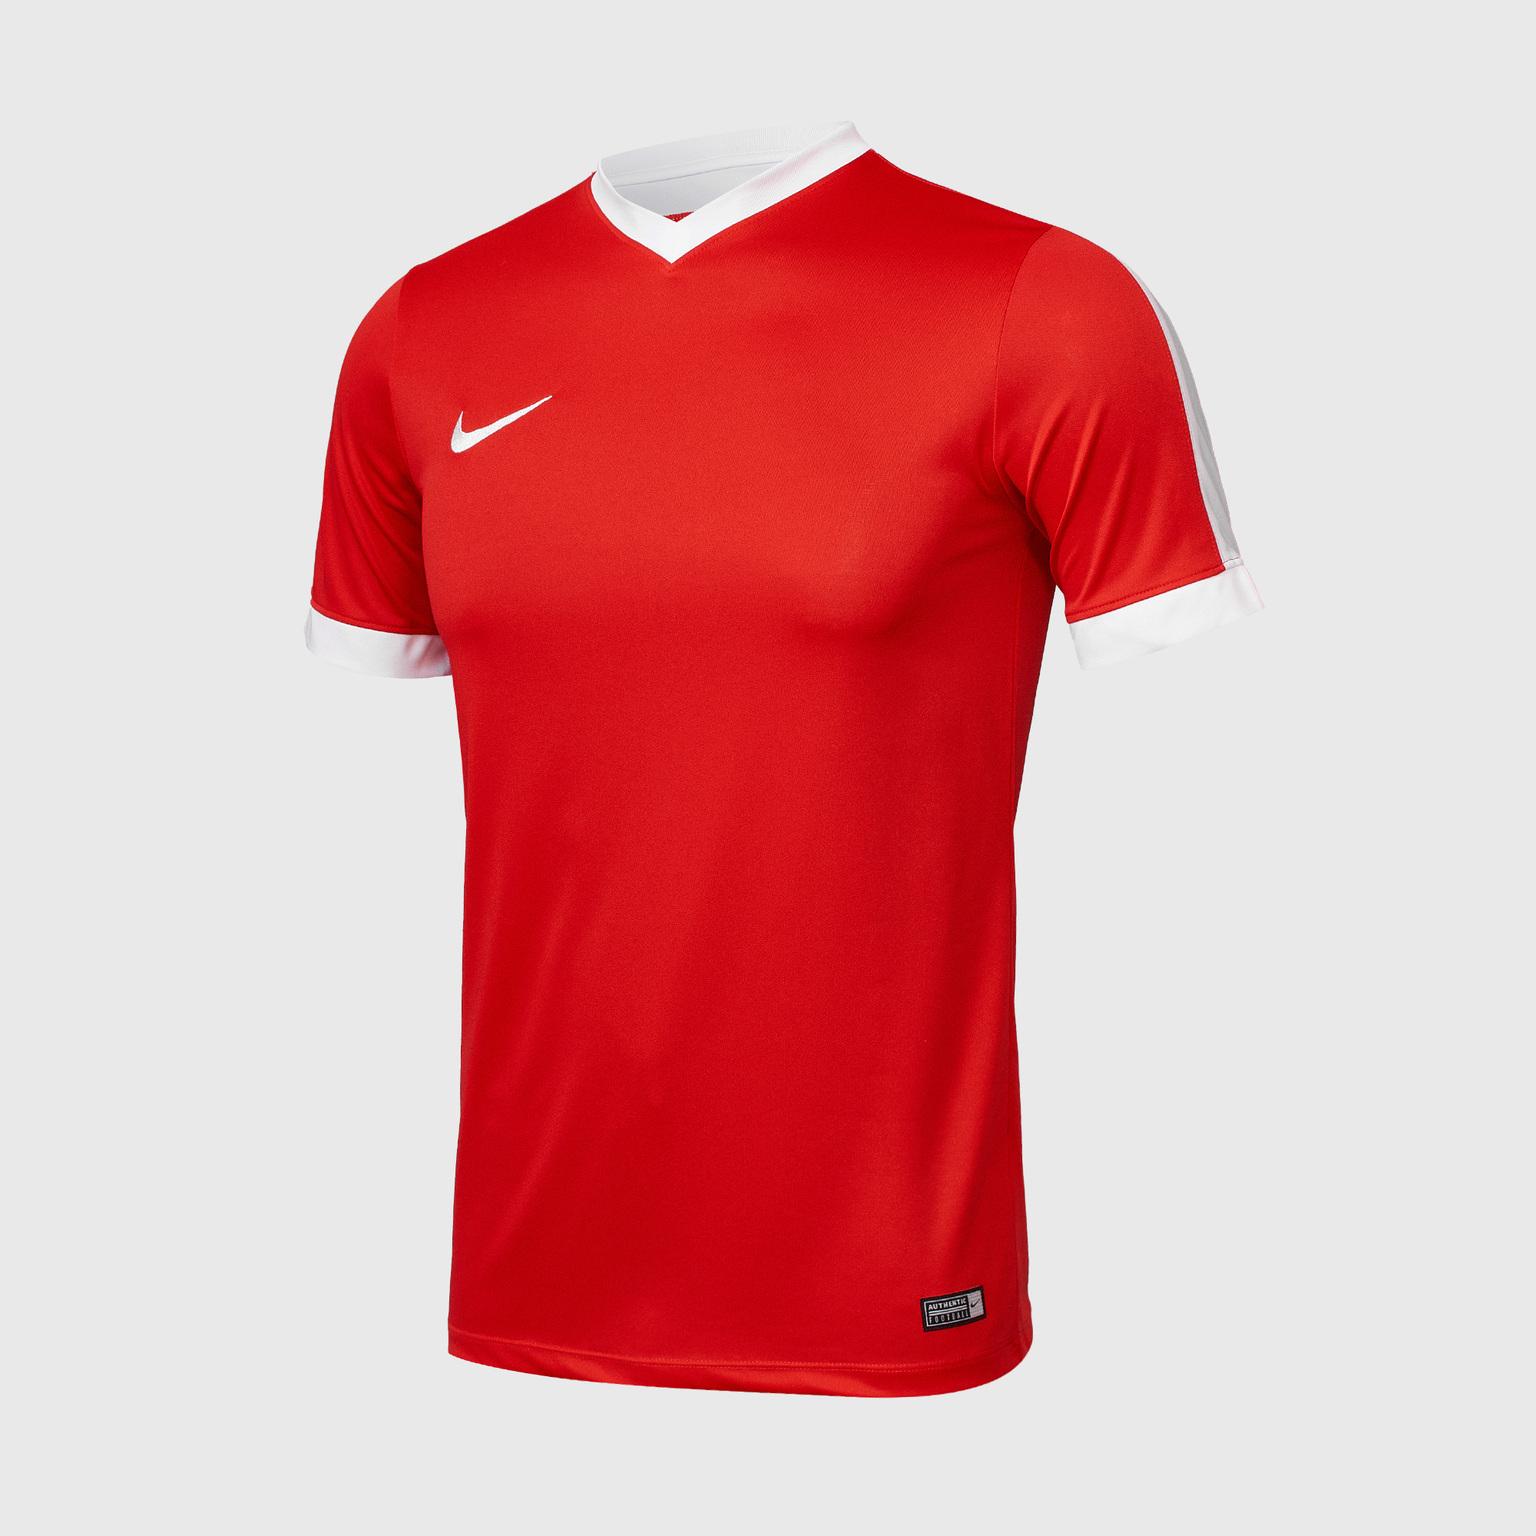 Футболки Nike Футболка Nike SS Striker IV JSY 725892-657 футболки nike футболка nike ss striker iv jsy 725892 815